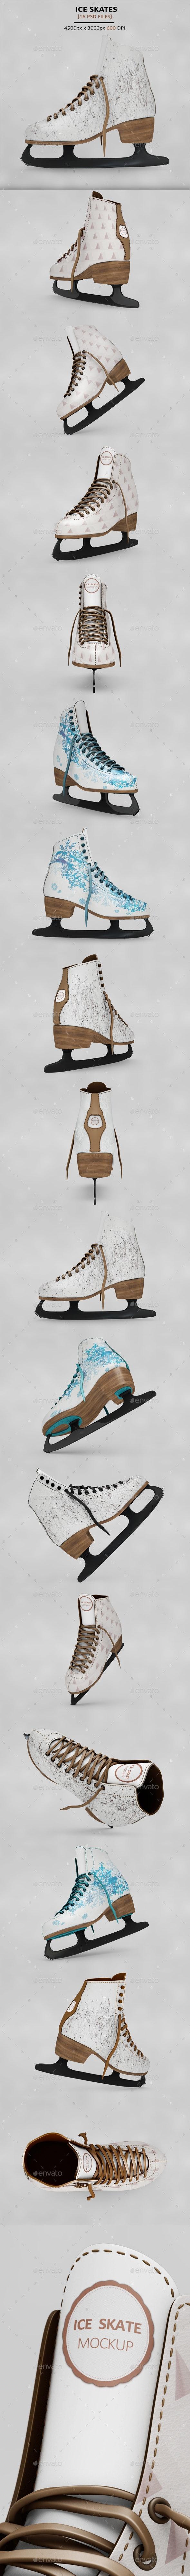 Ice Skate Mockup - Product Mock-Ups Graphics